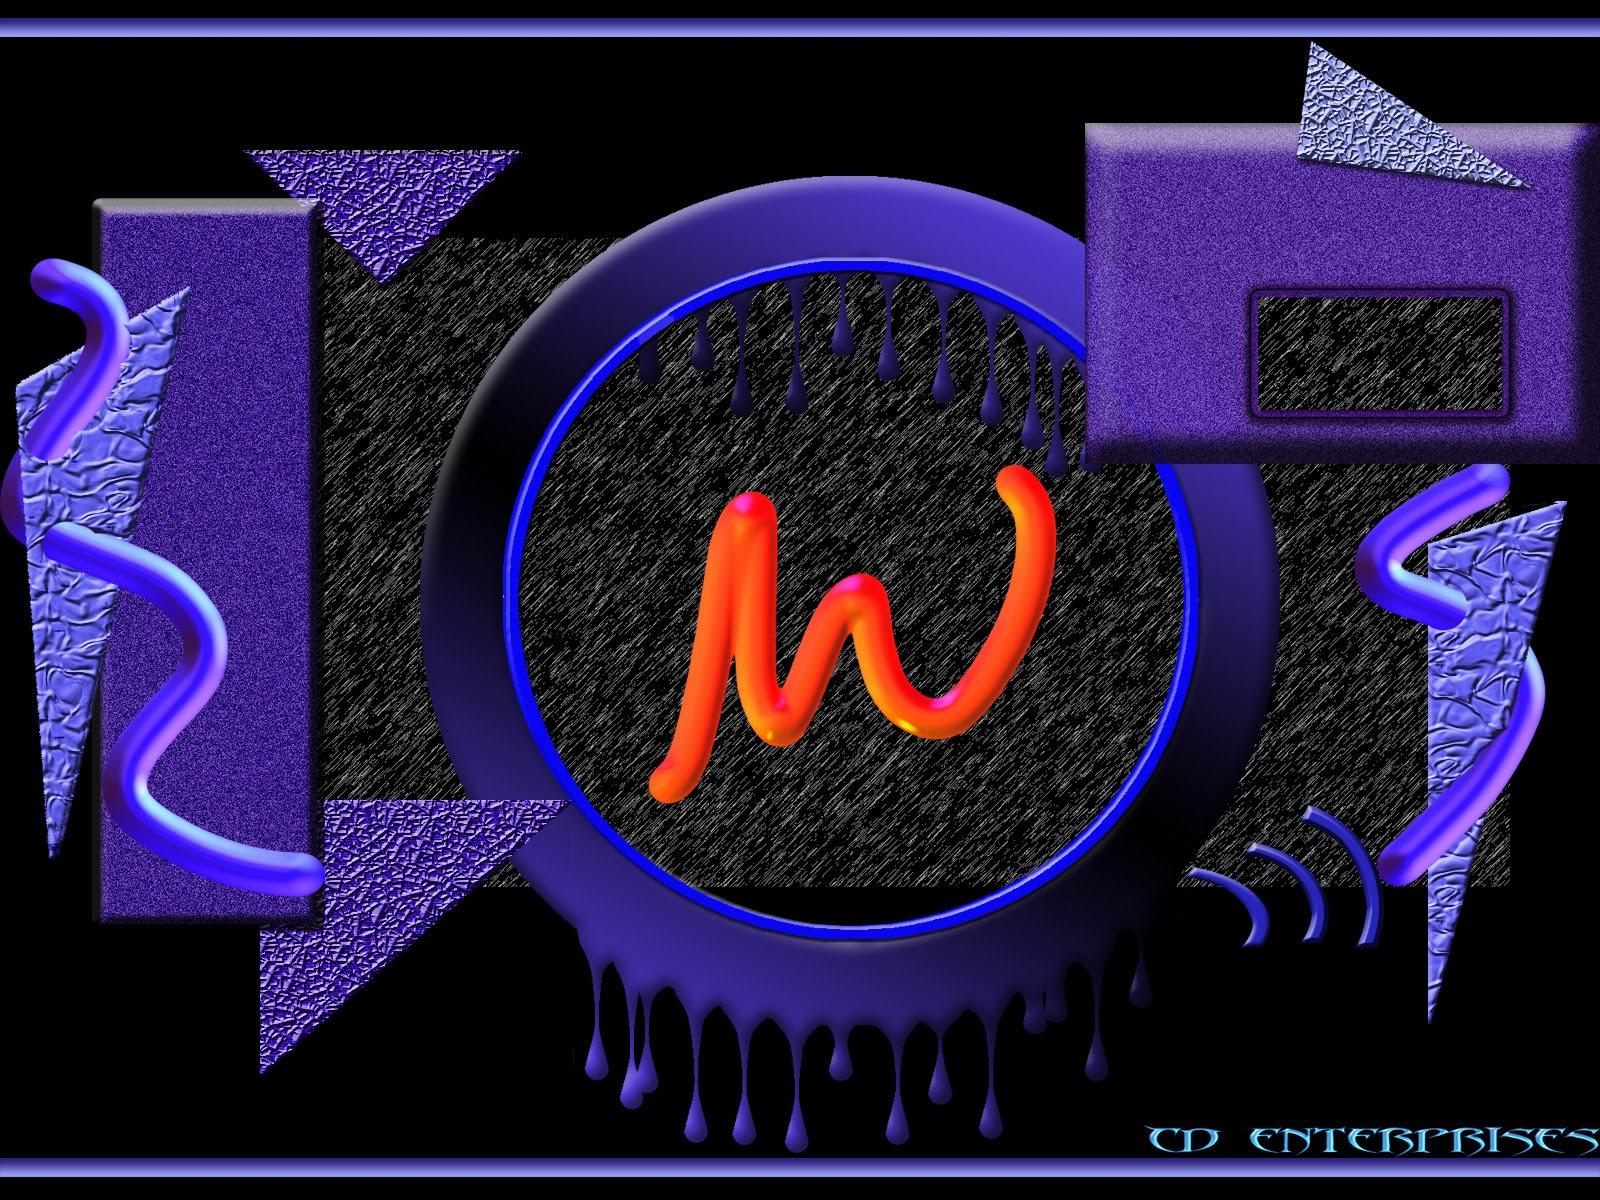 http://3.bp.blogspot.com/_1eqZ2PvXg3c/S9pwaOn6GII/AAAAAAAAK6E/Ysh-KsWYLiw/s1600/digital-wallpaper016.jpg